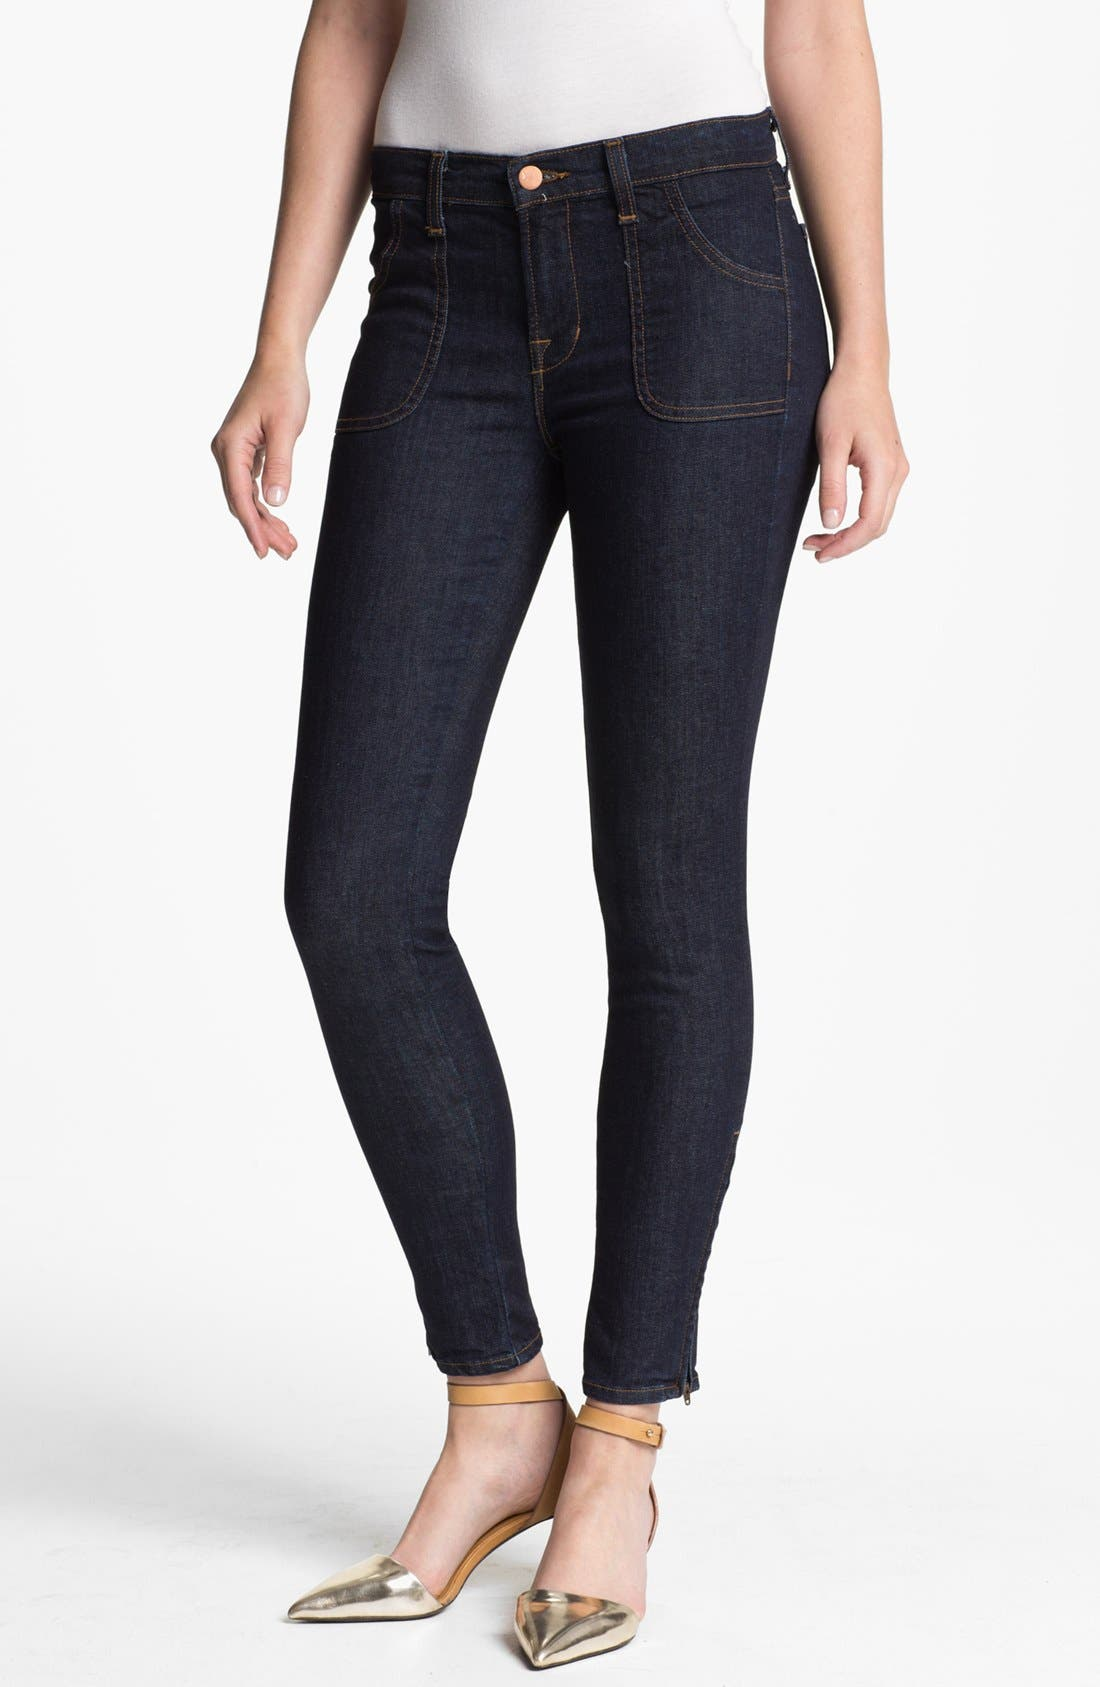 Alternate Image 1 Selected - J Brand 'Retro' Skinny Ankle Zip Jeans (Clean Rinse)